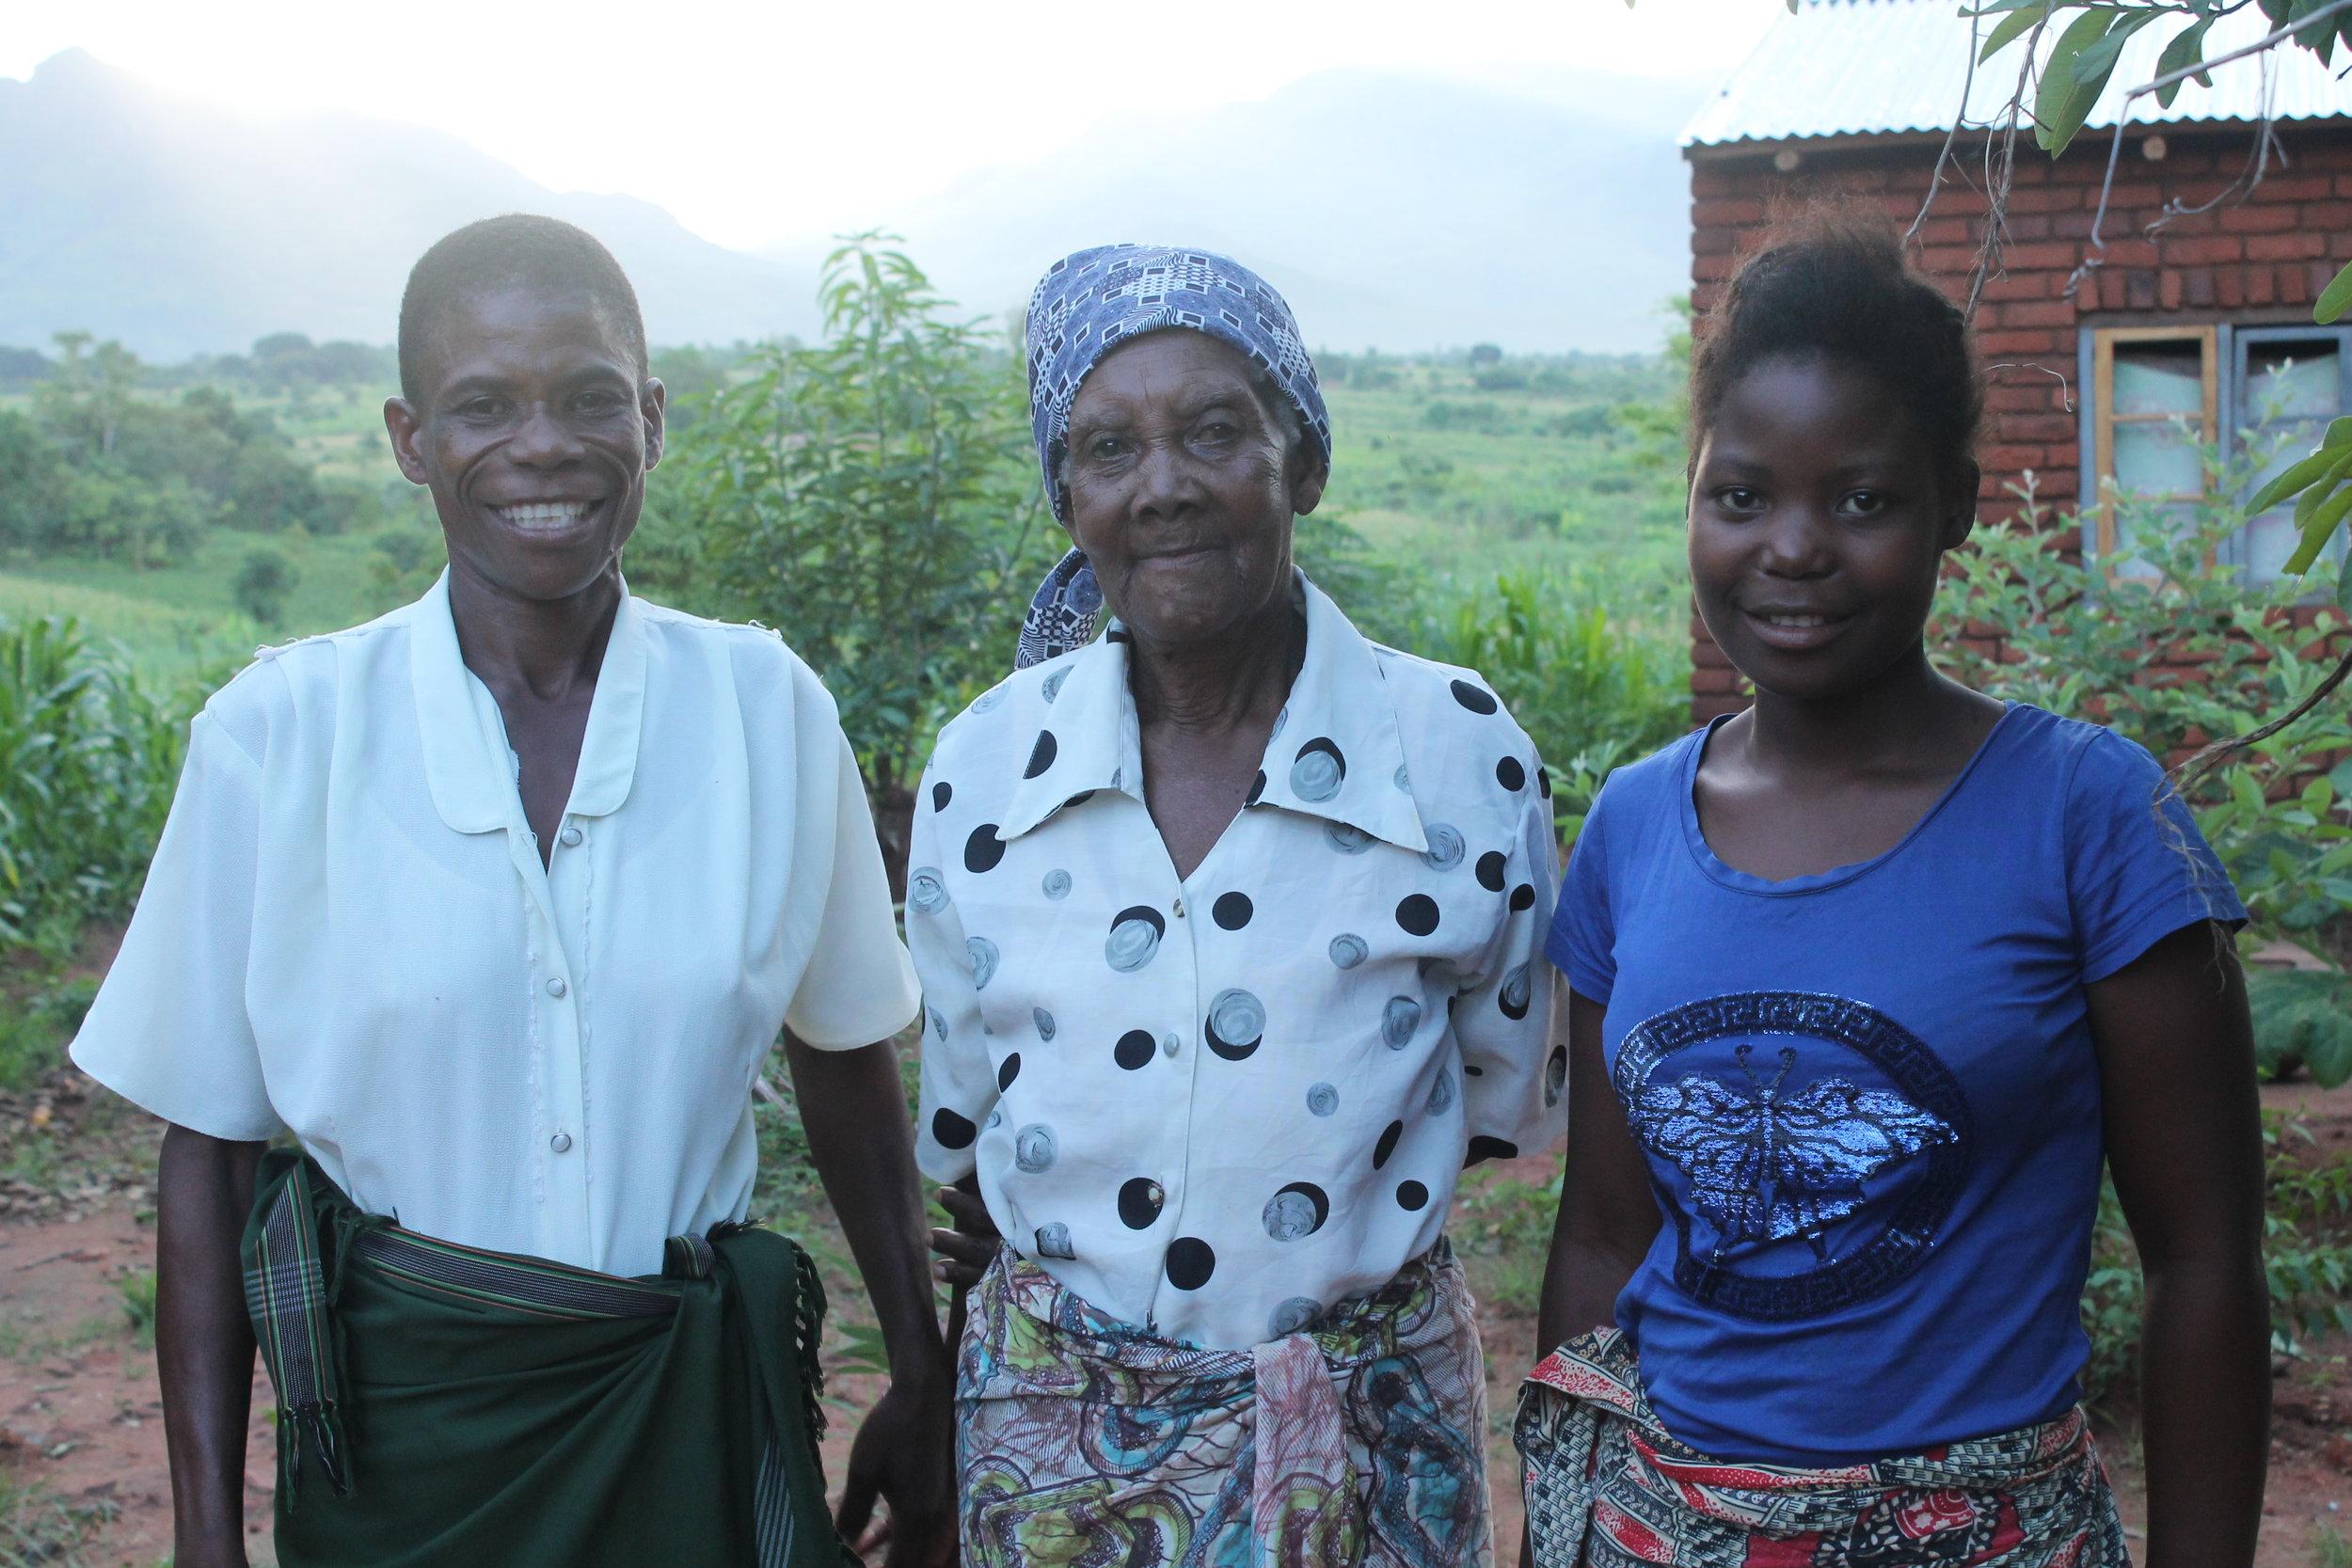 Three generations: SSP sponsored student, Chikondi, on the right.